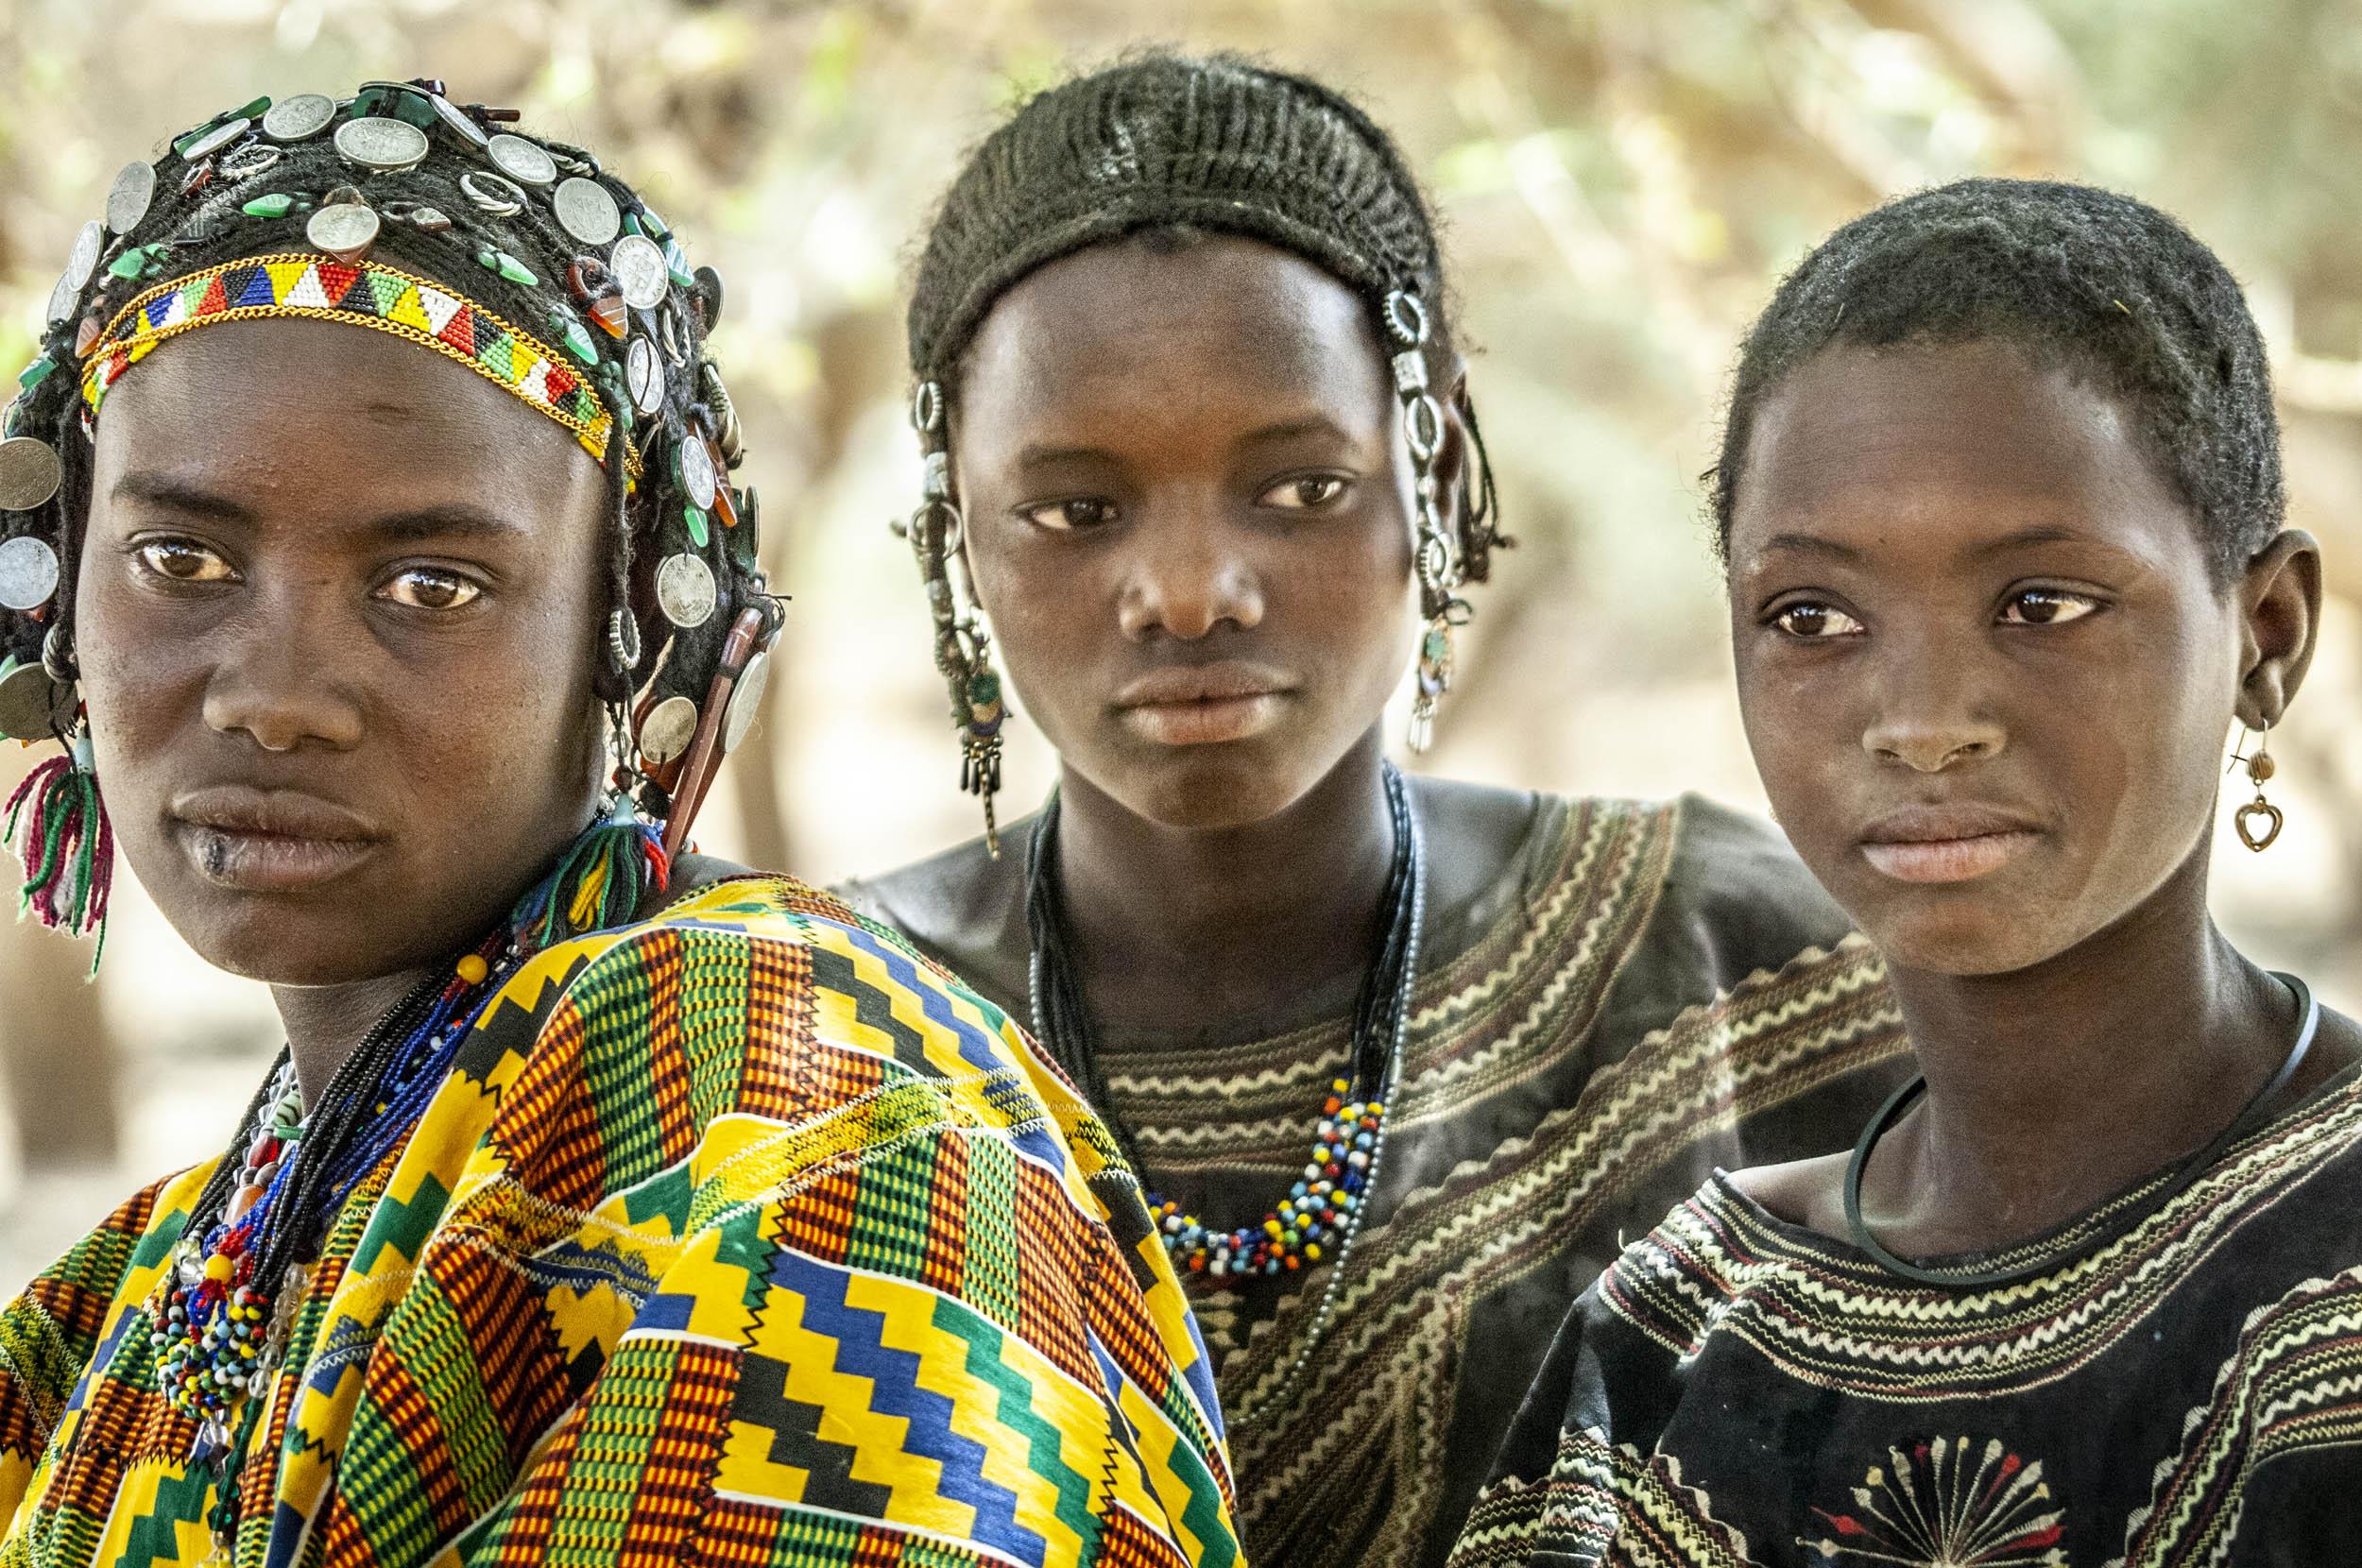 Belas, Burkina Faso - Ethnoland - Hector Garrido, Aerial and human photography